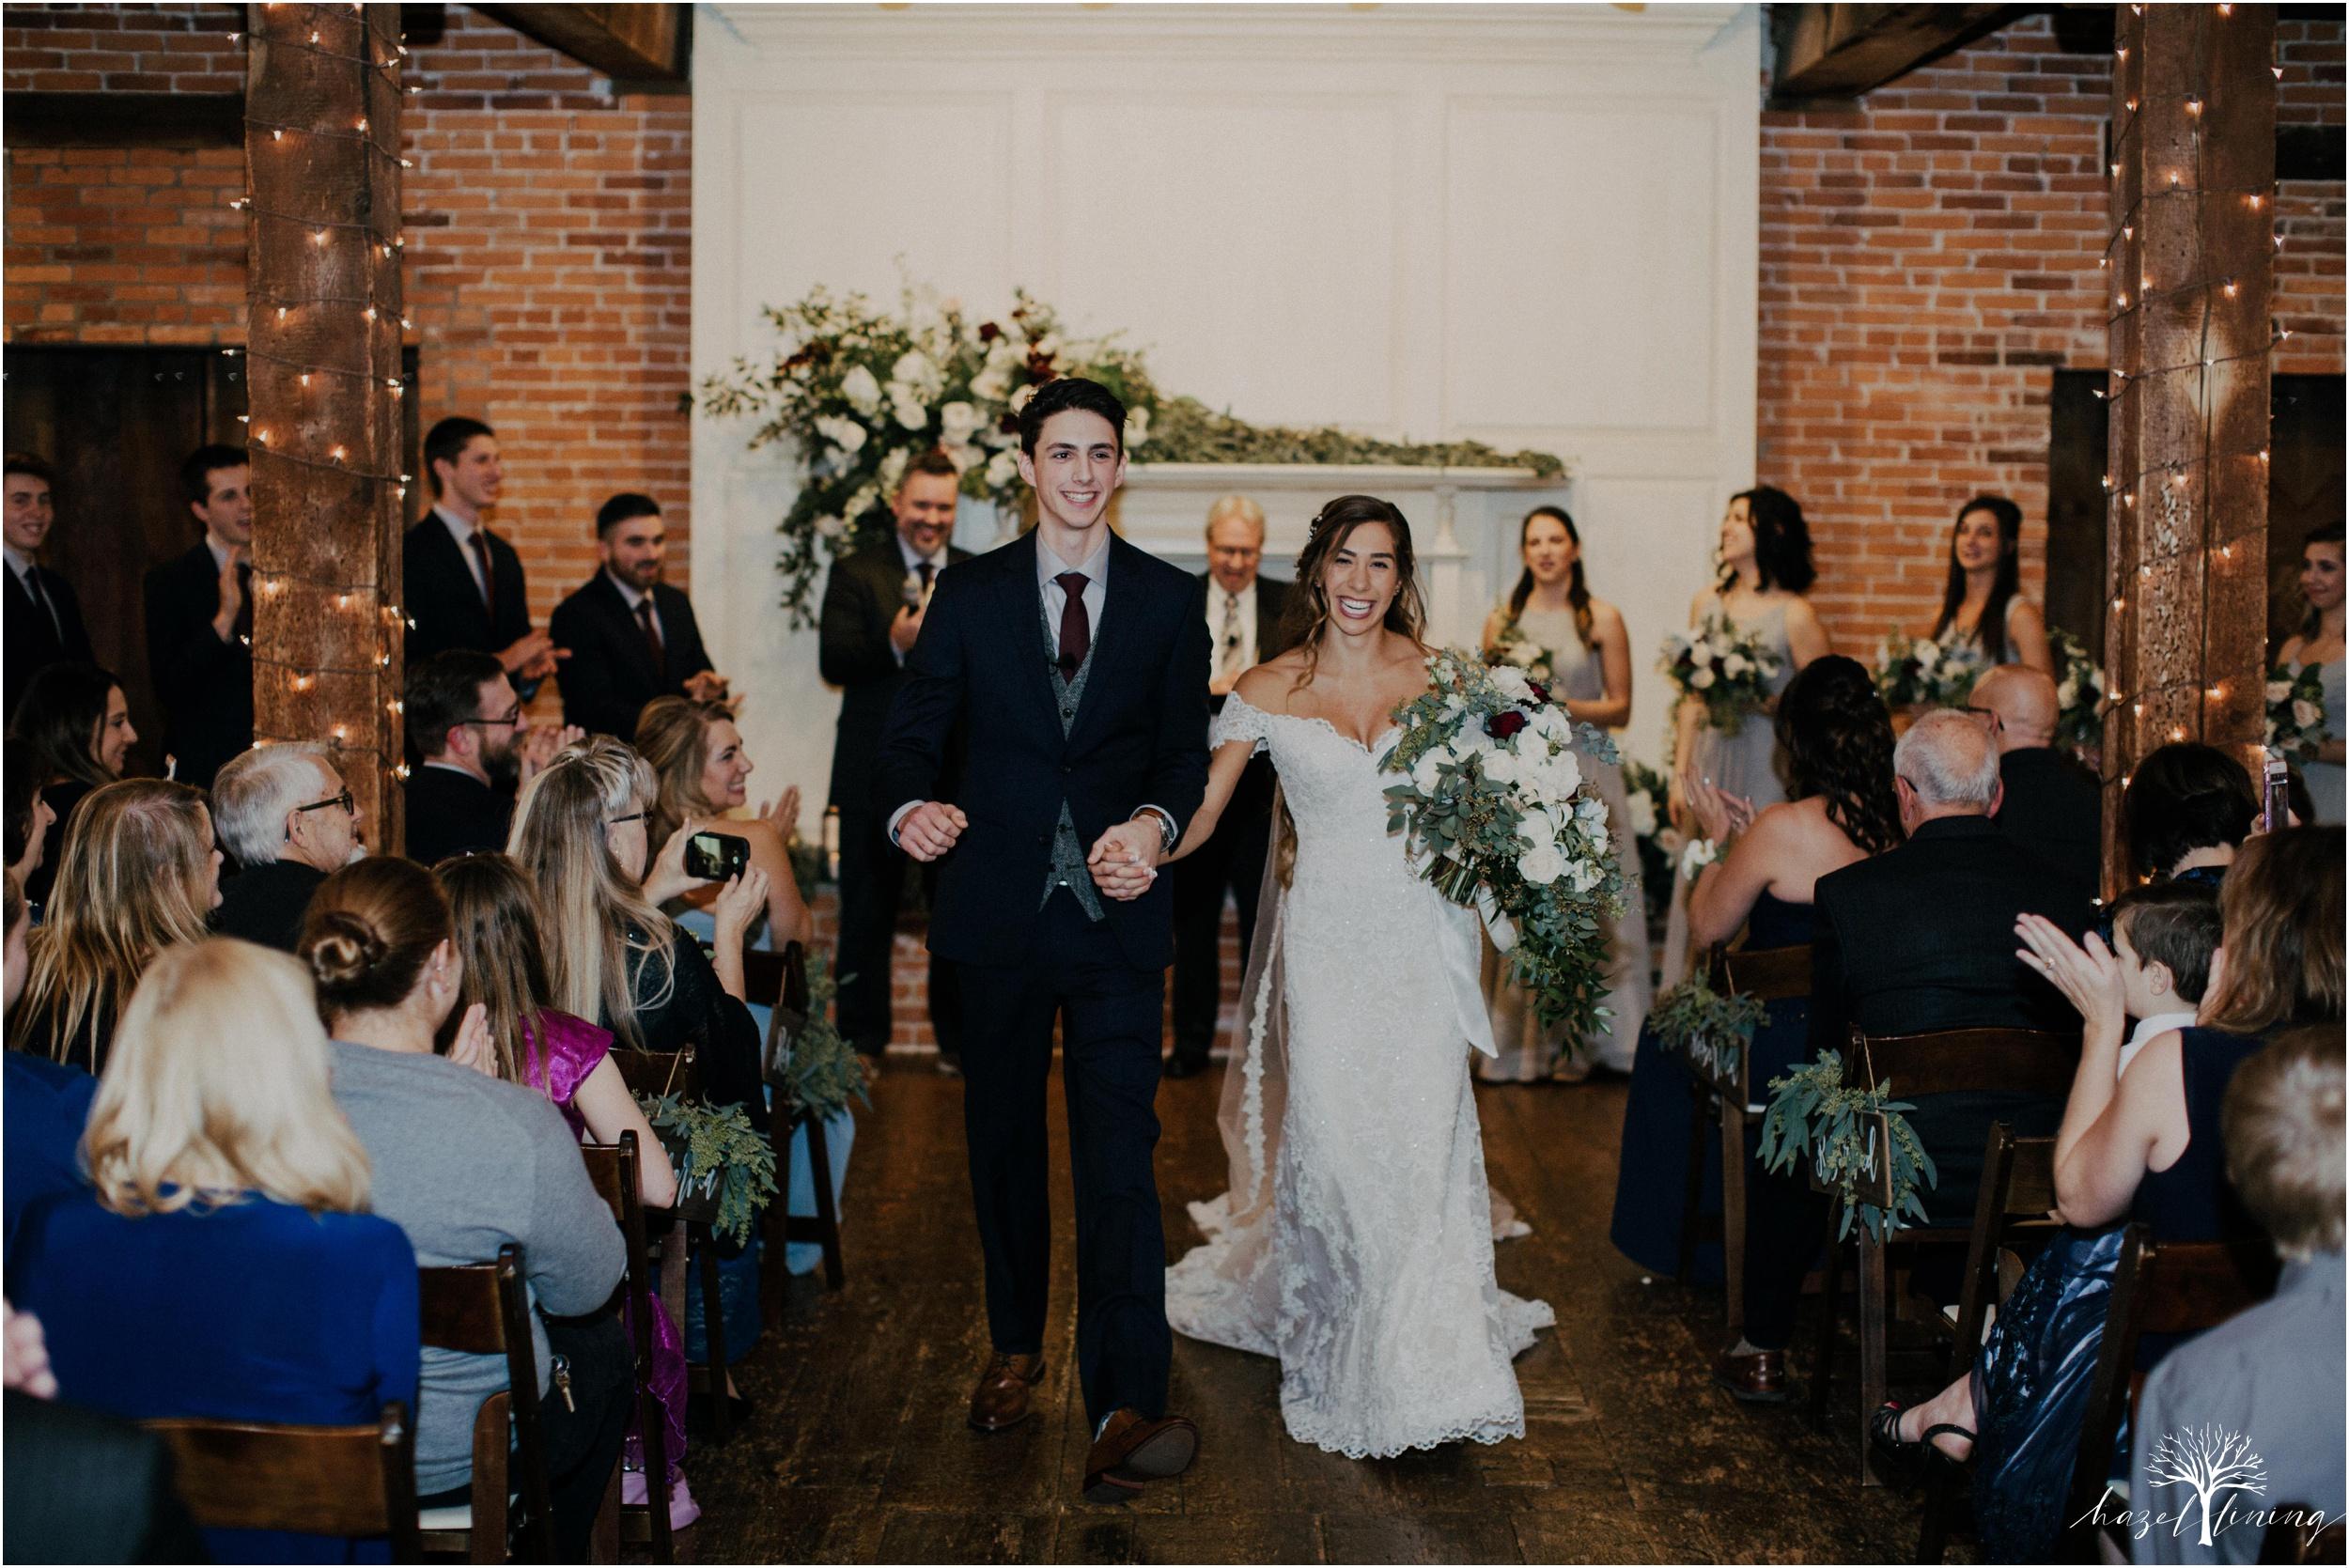 emma-matt-gehringer-the-booking-house-lancaster-manhiem-pennsylvania-winter-wedding_0066.jpg